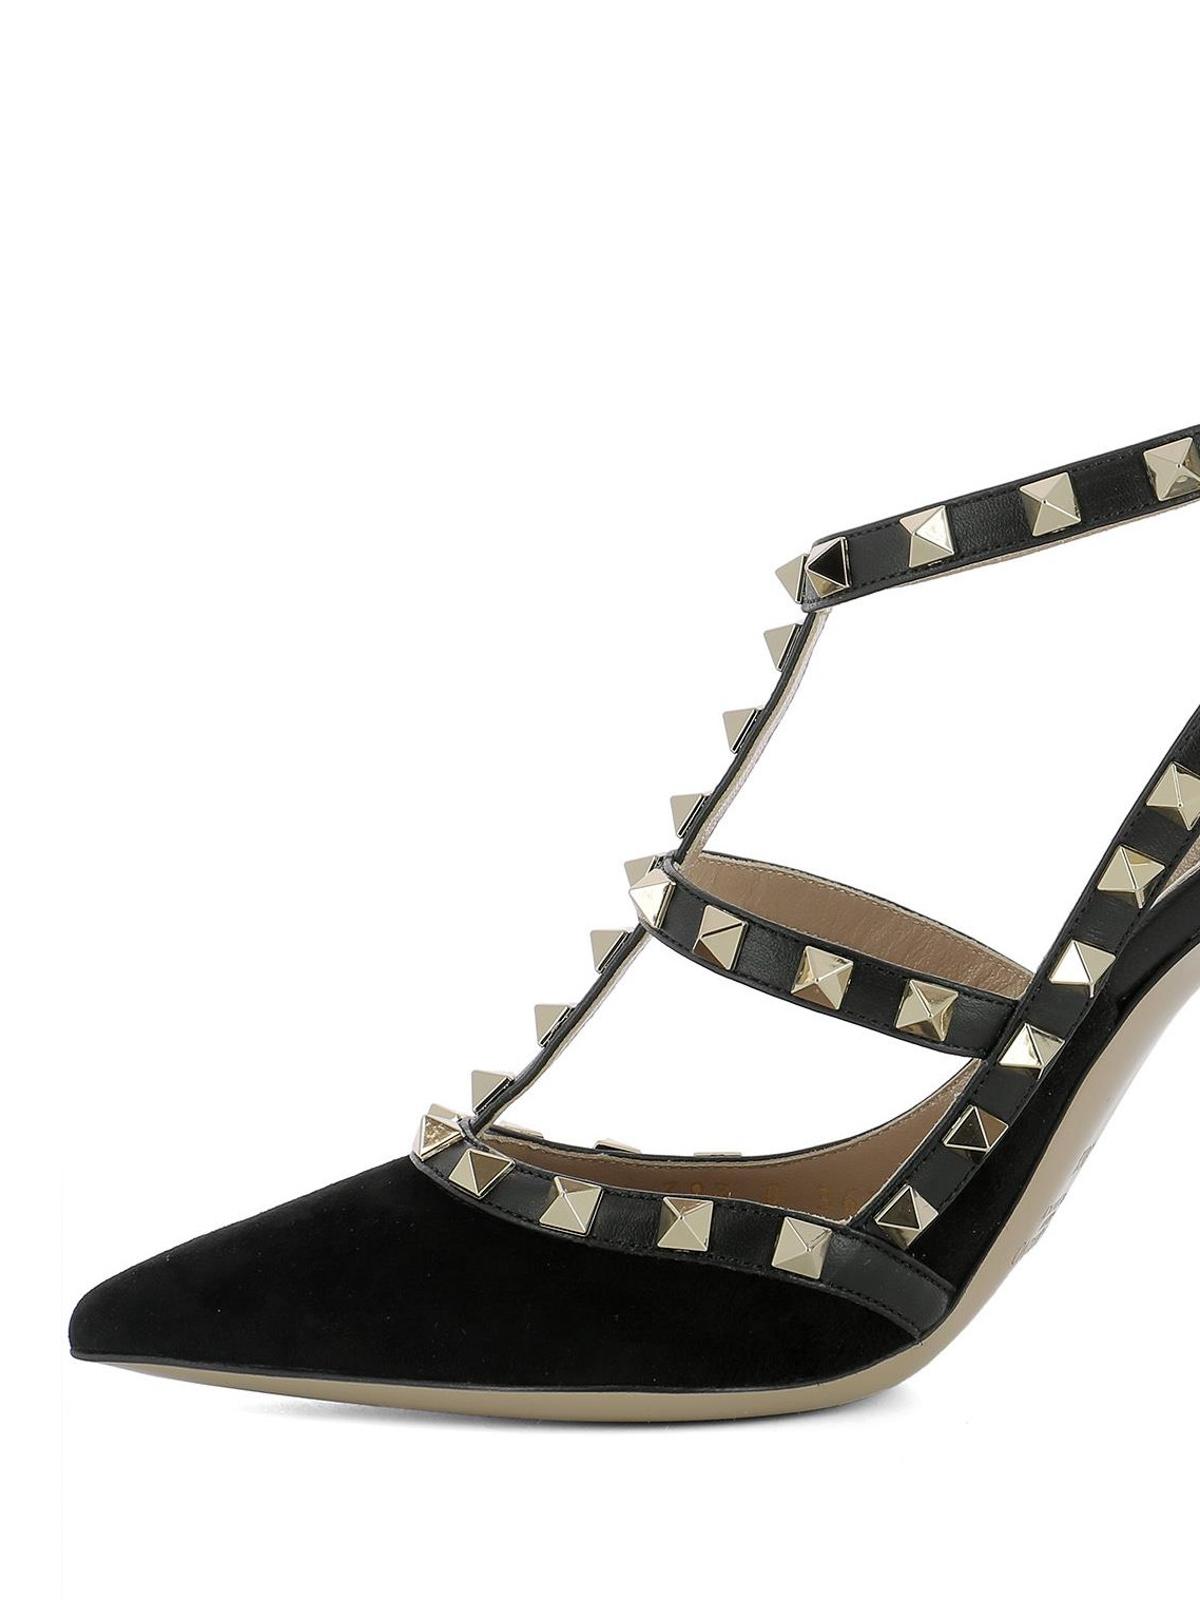 203cb9be8b5ab iKRIX VALENTINO GARAVANI: court shoes - Rockstud black suede pumps